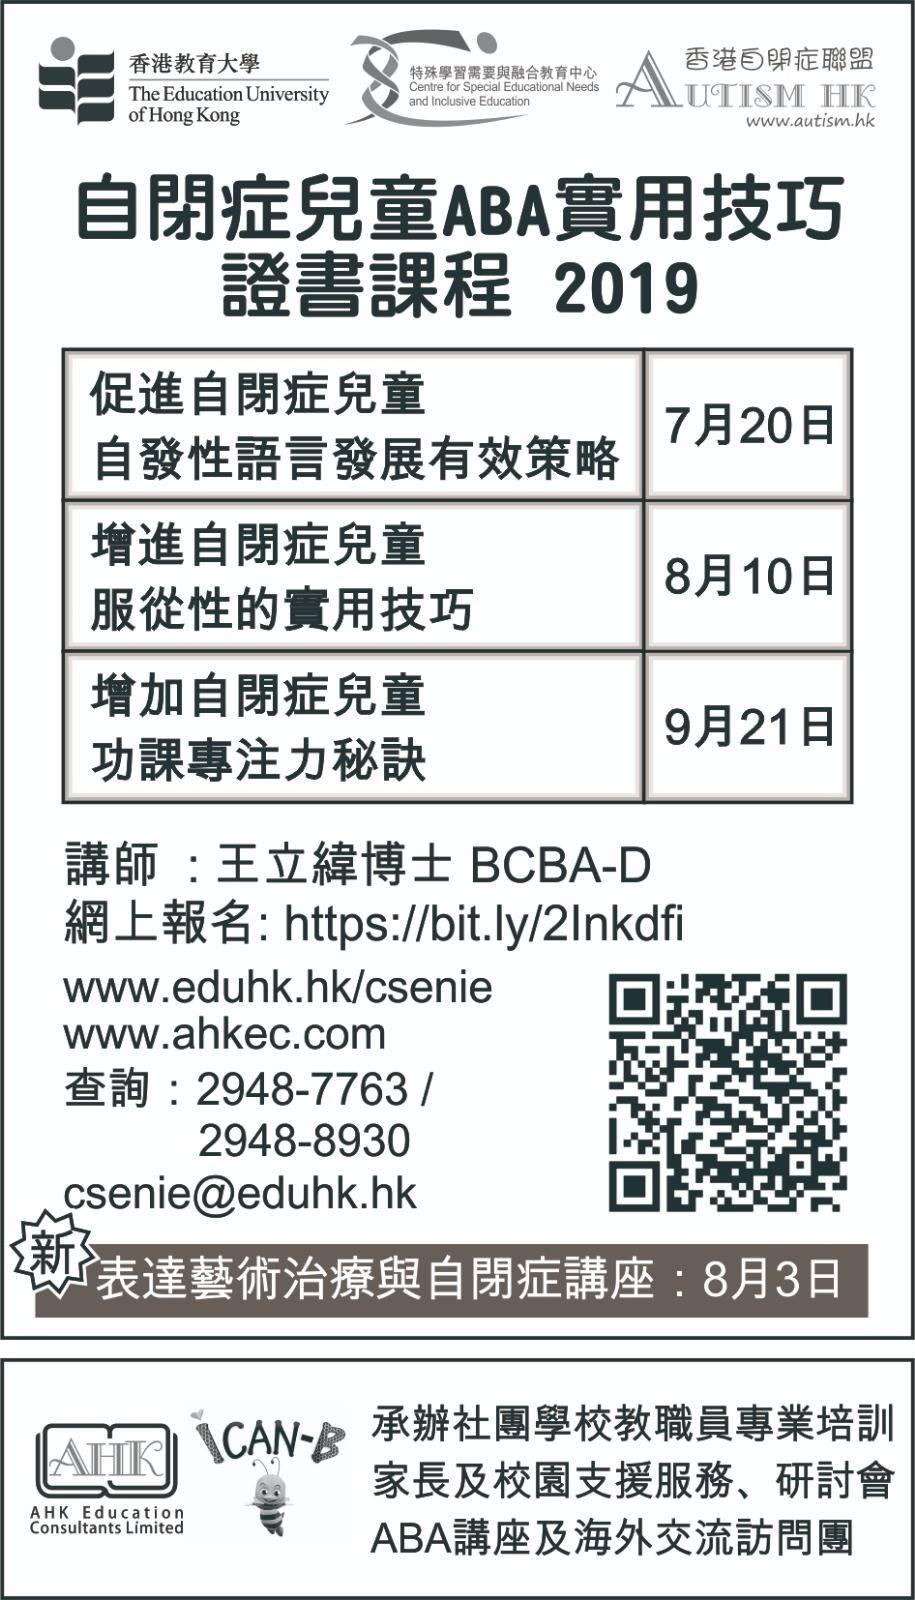 ABA Training Courses